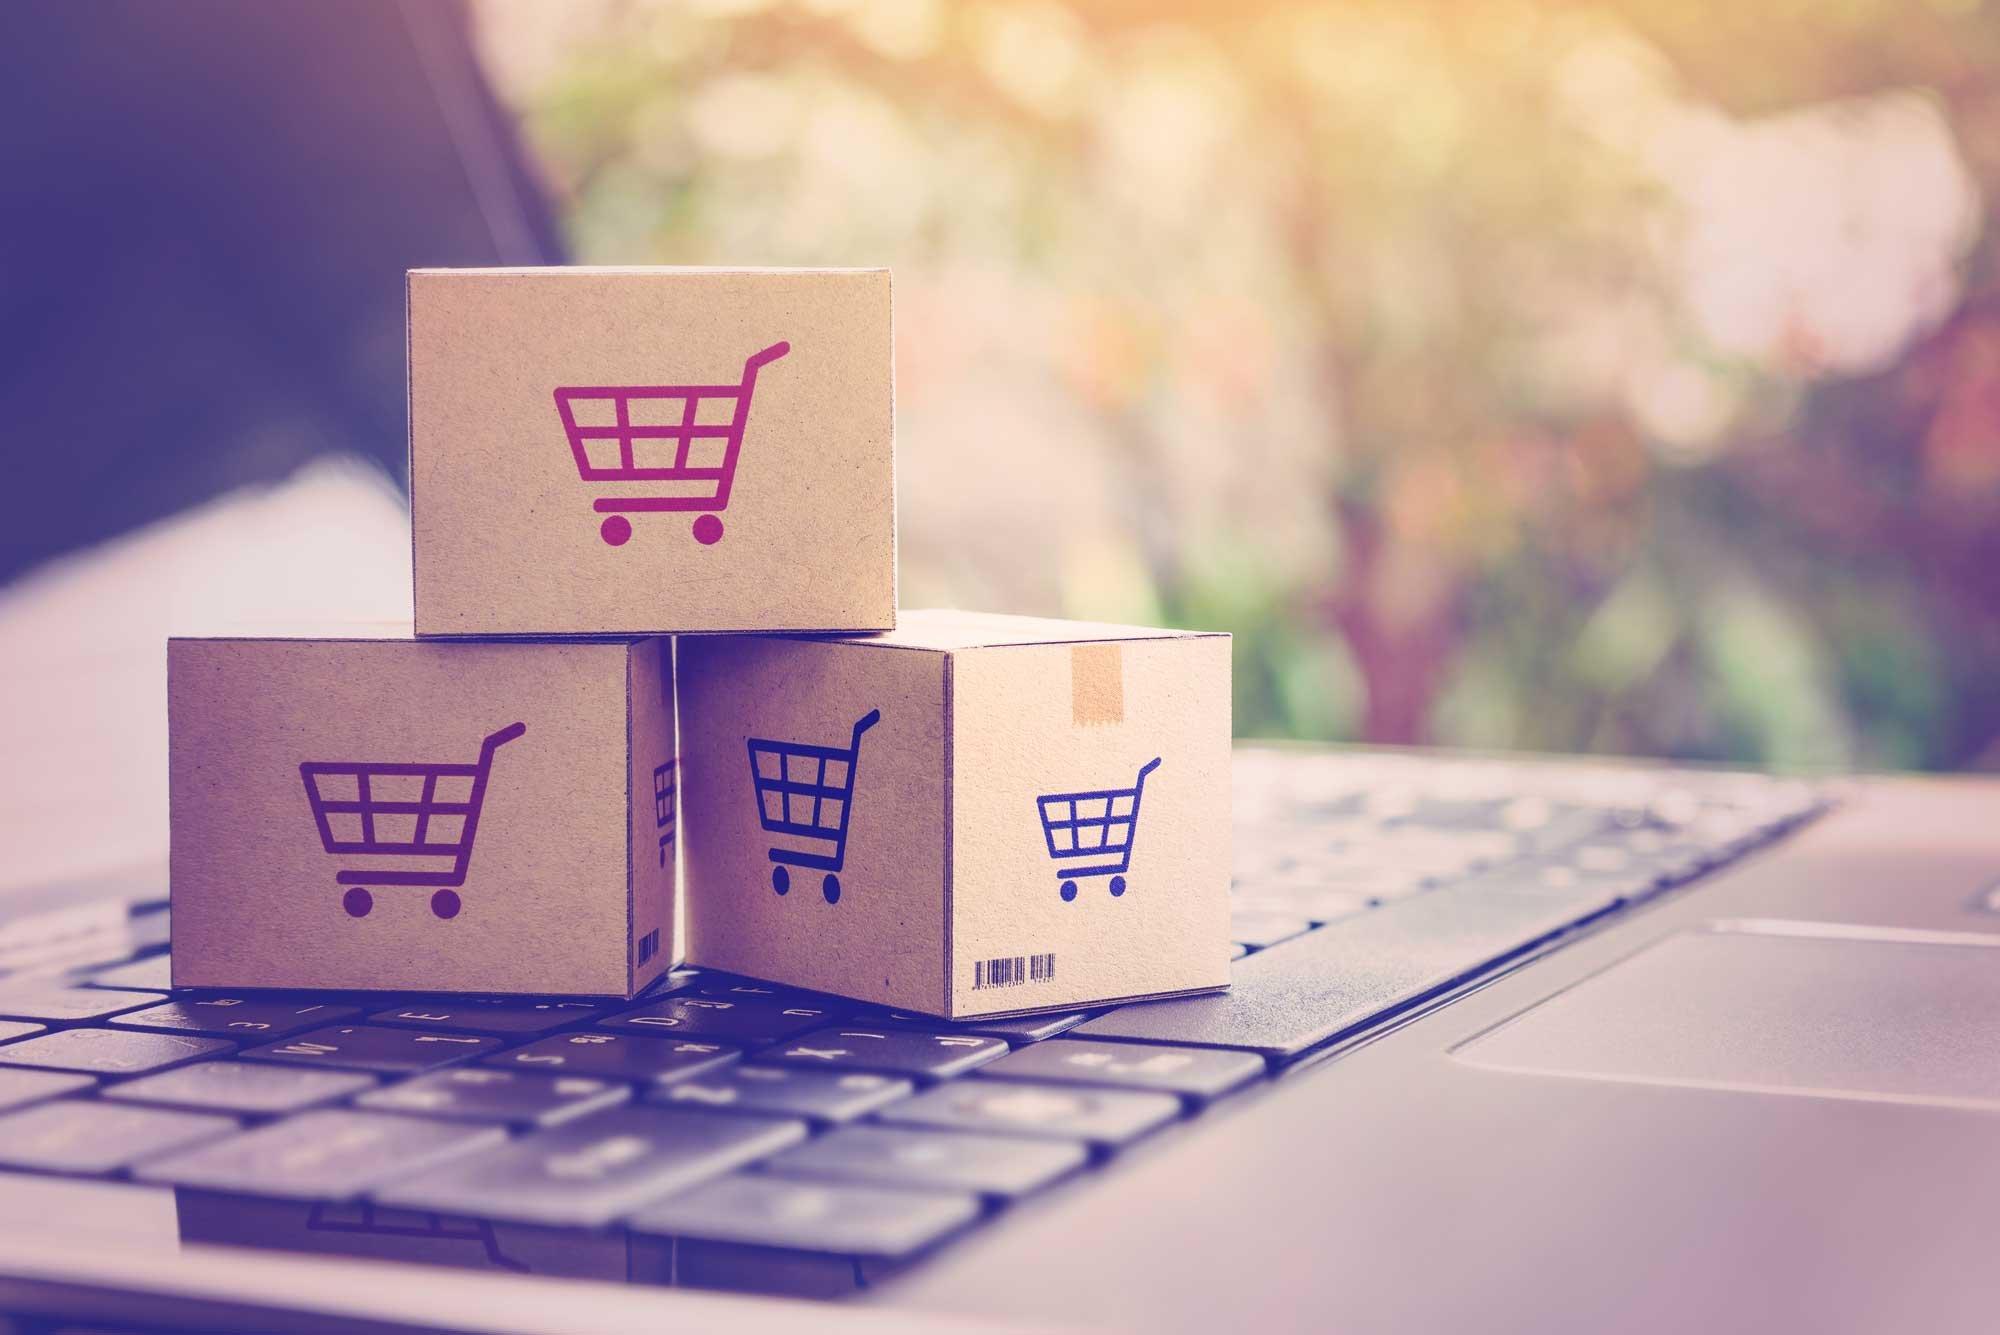 Digital transformation in commerce